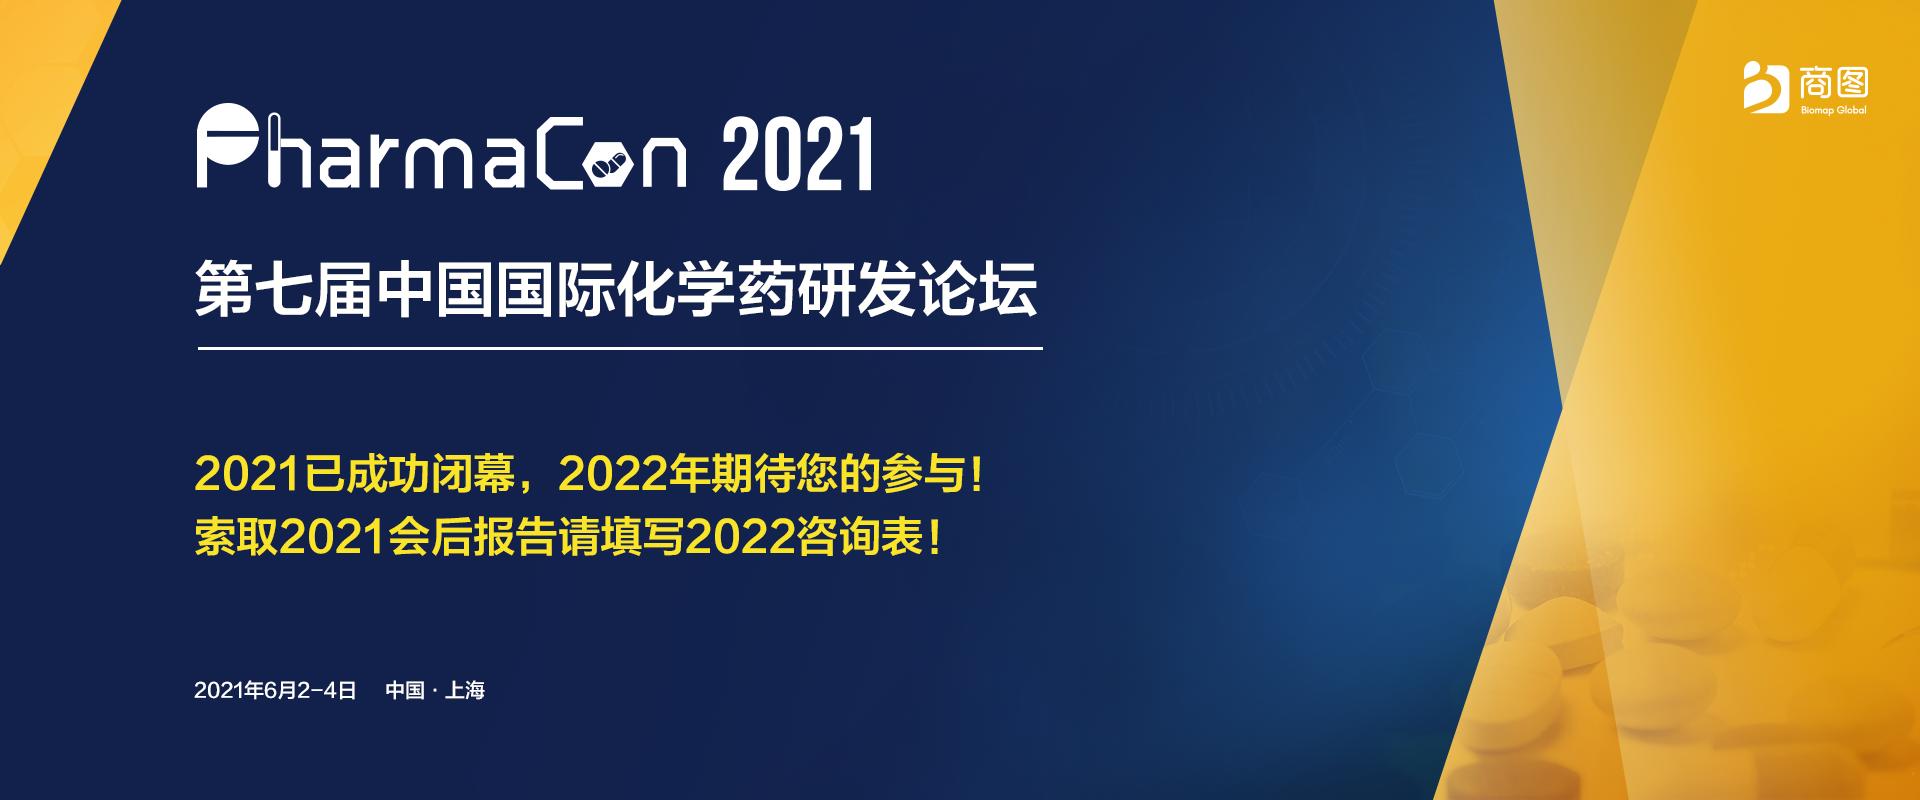 PharmaCon 2021第七届中国国际化学药研发论坛